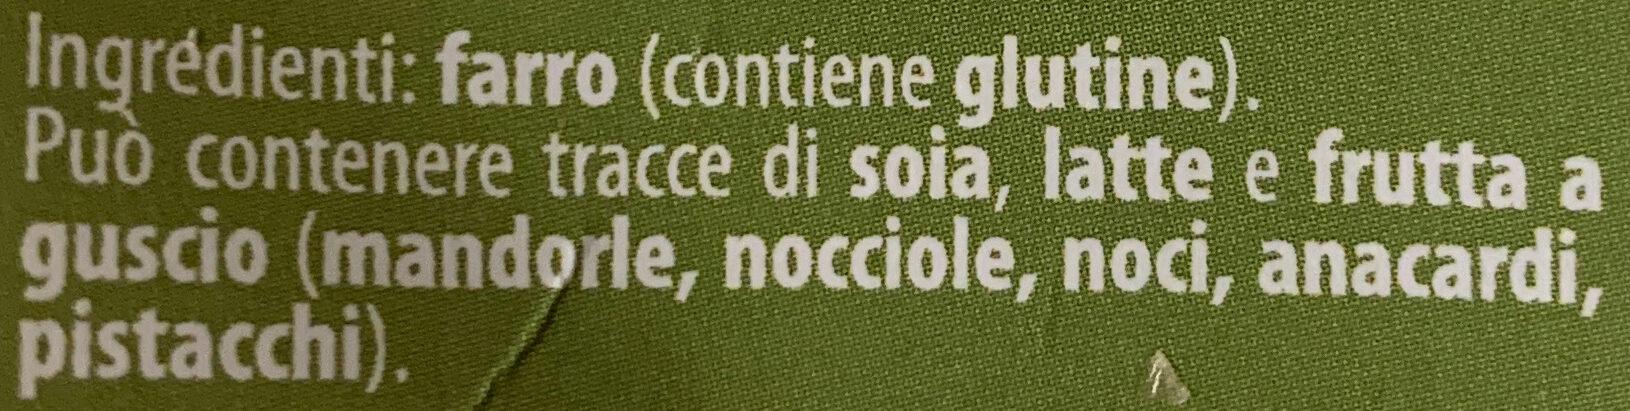 Farro soffiato - Ingredients - it